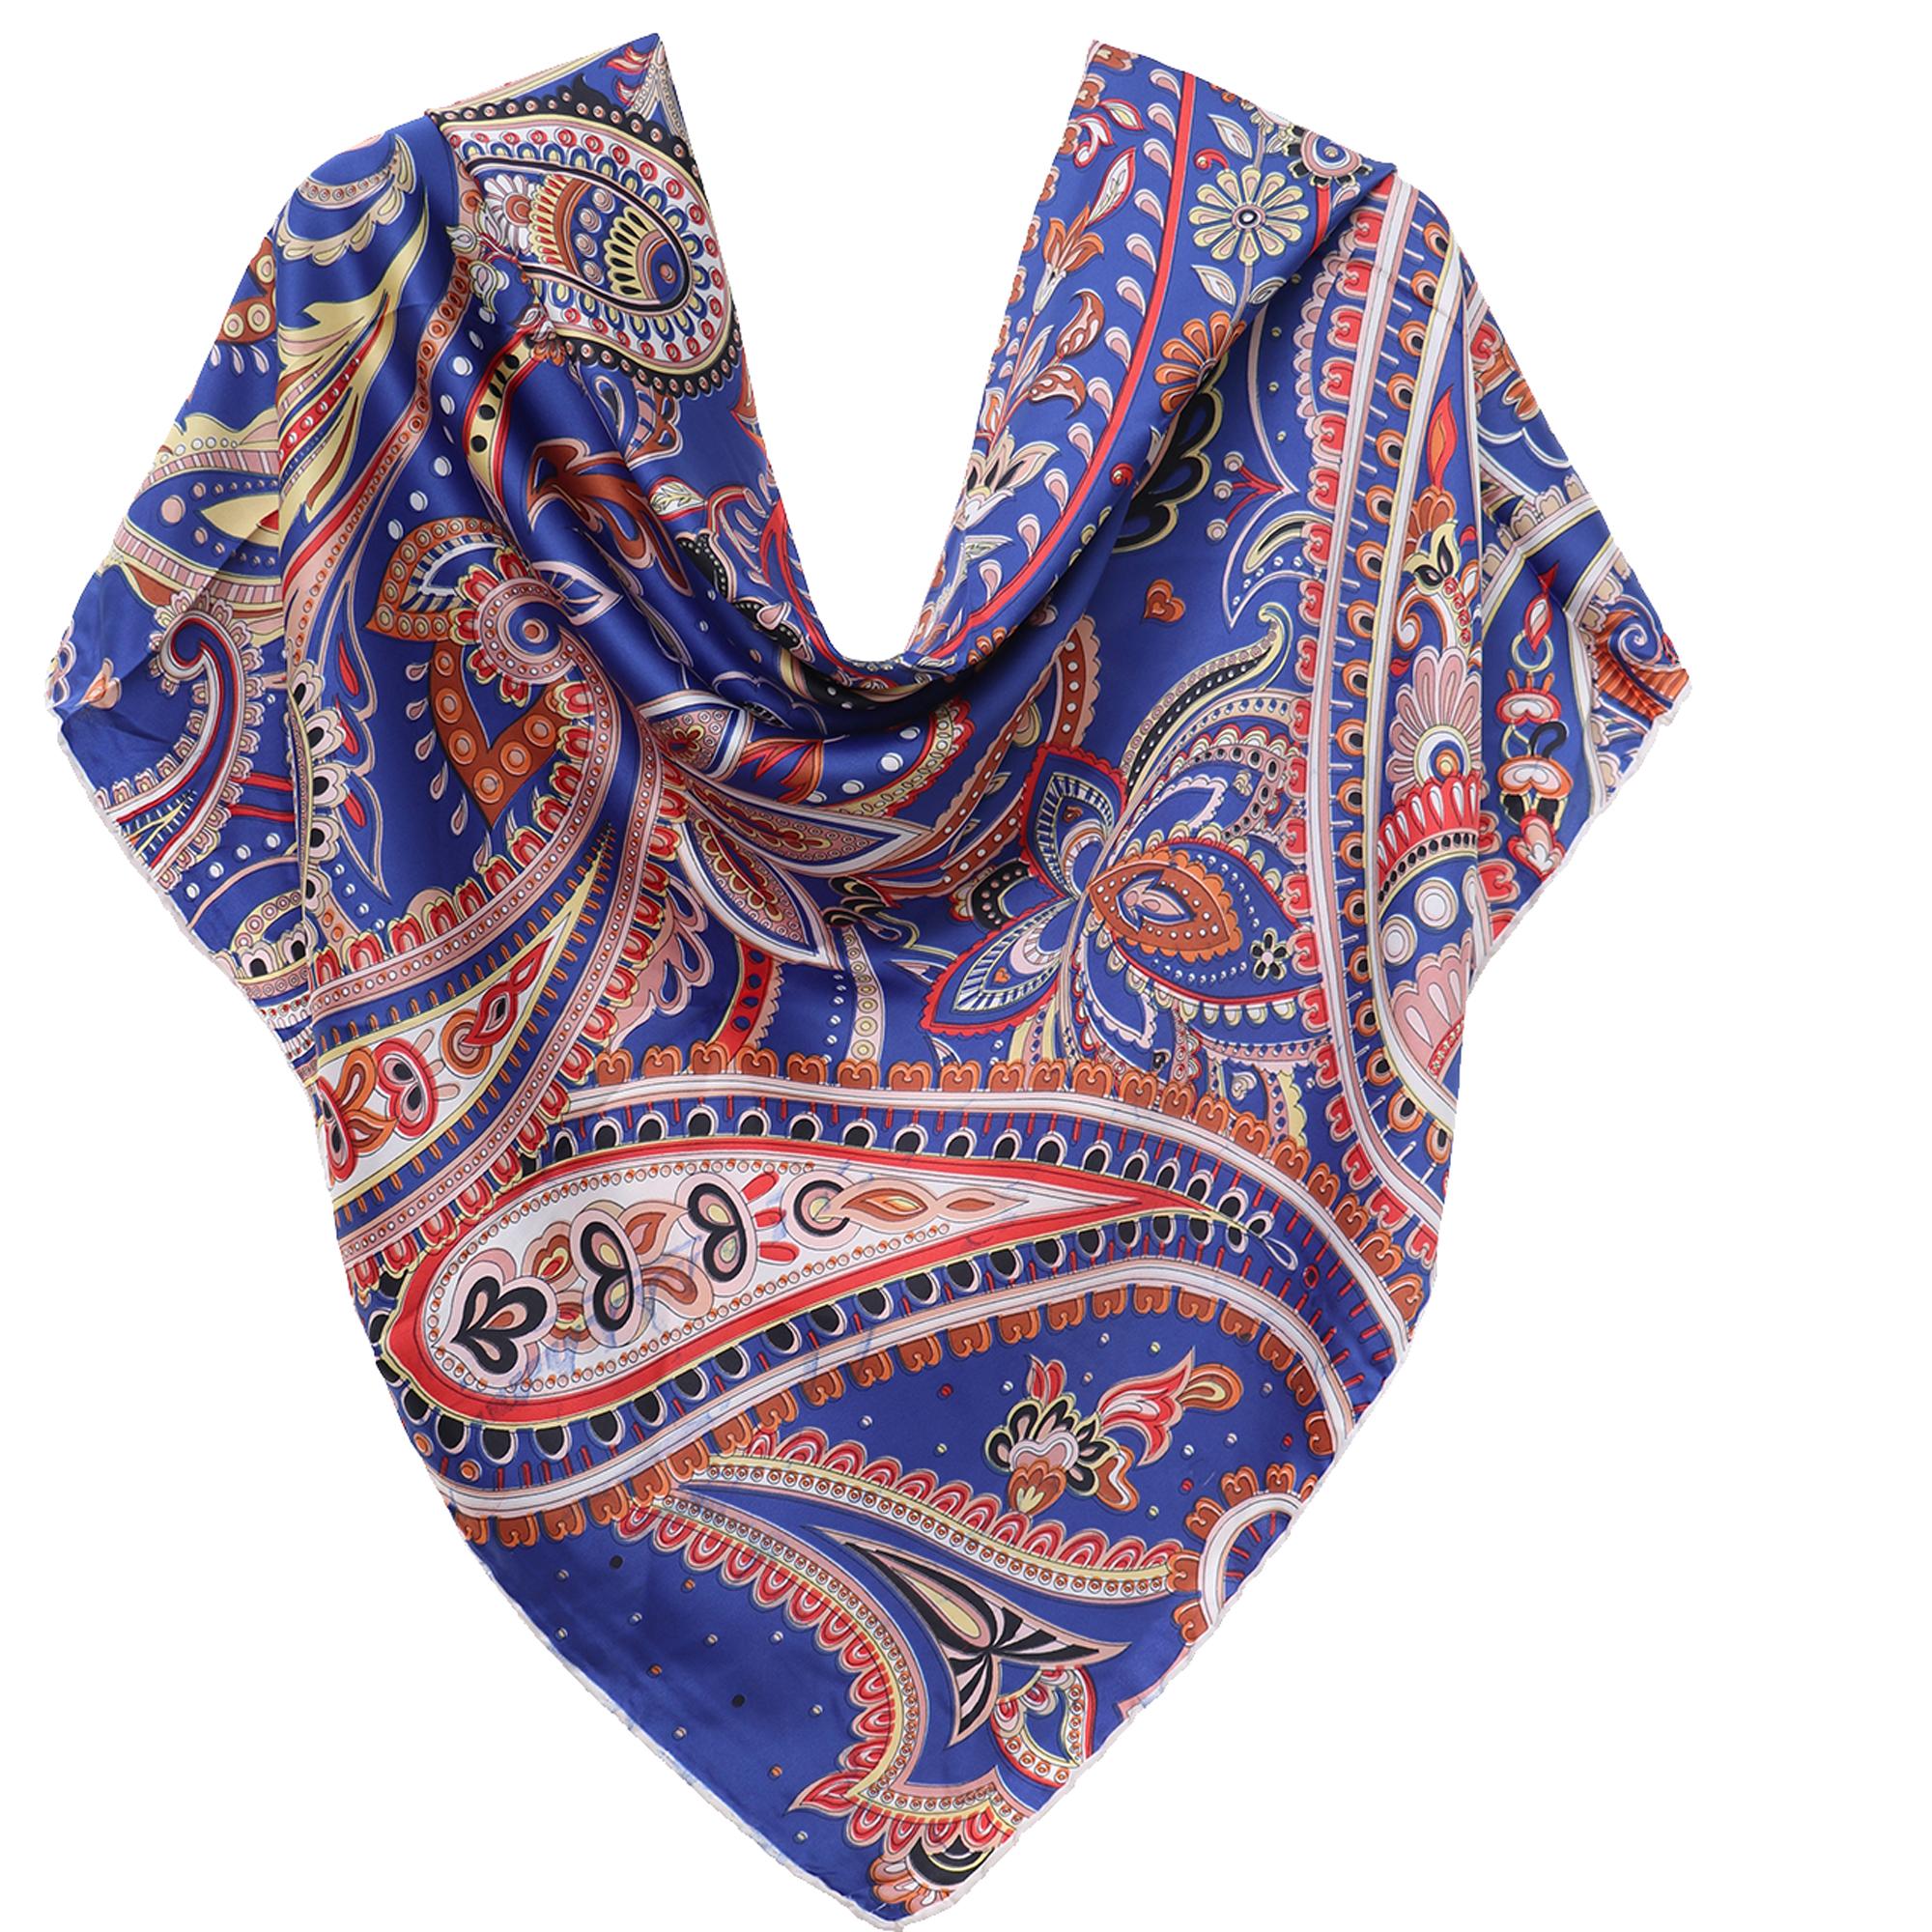 روسری زنانه کد 48-tp-3793